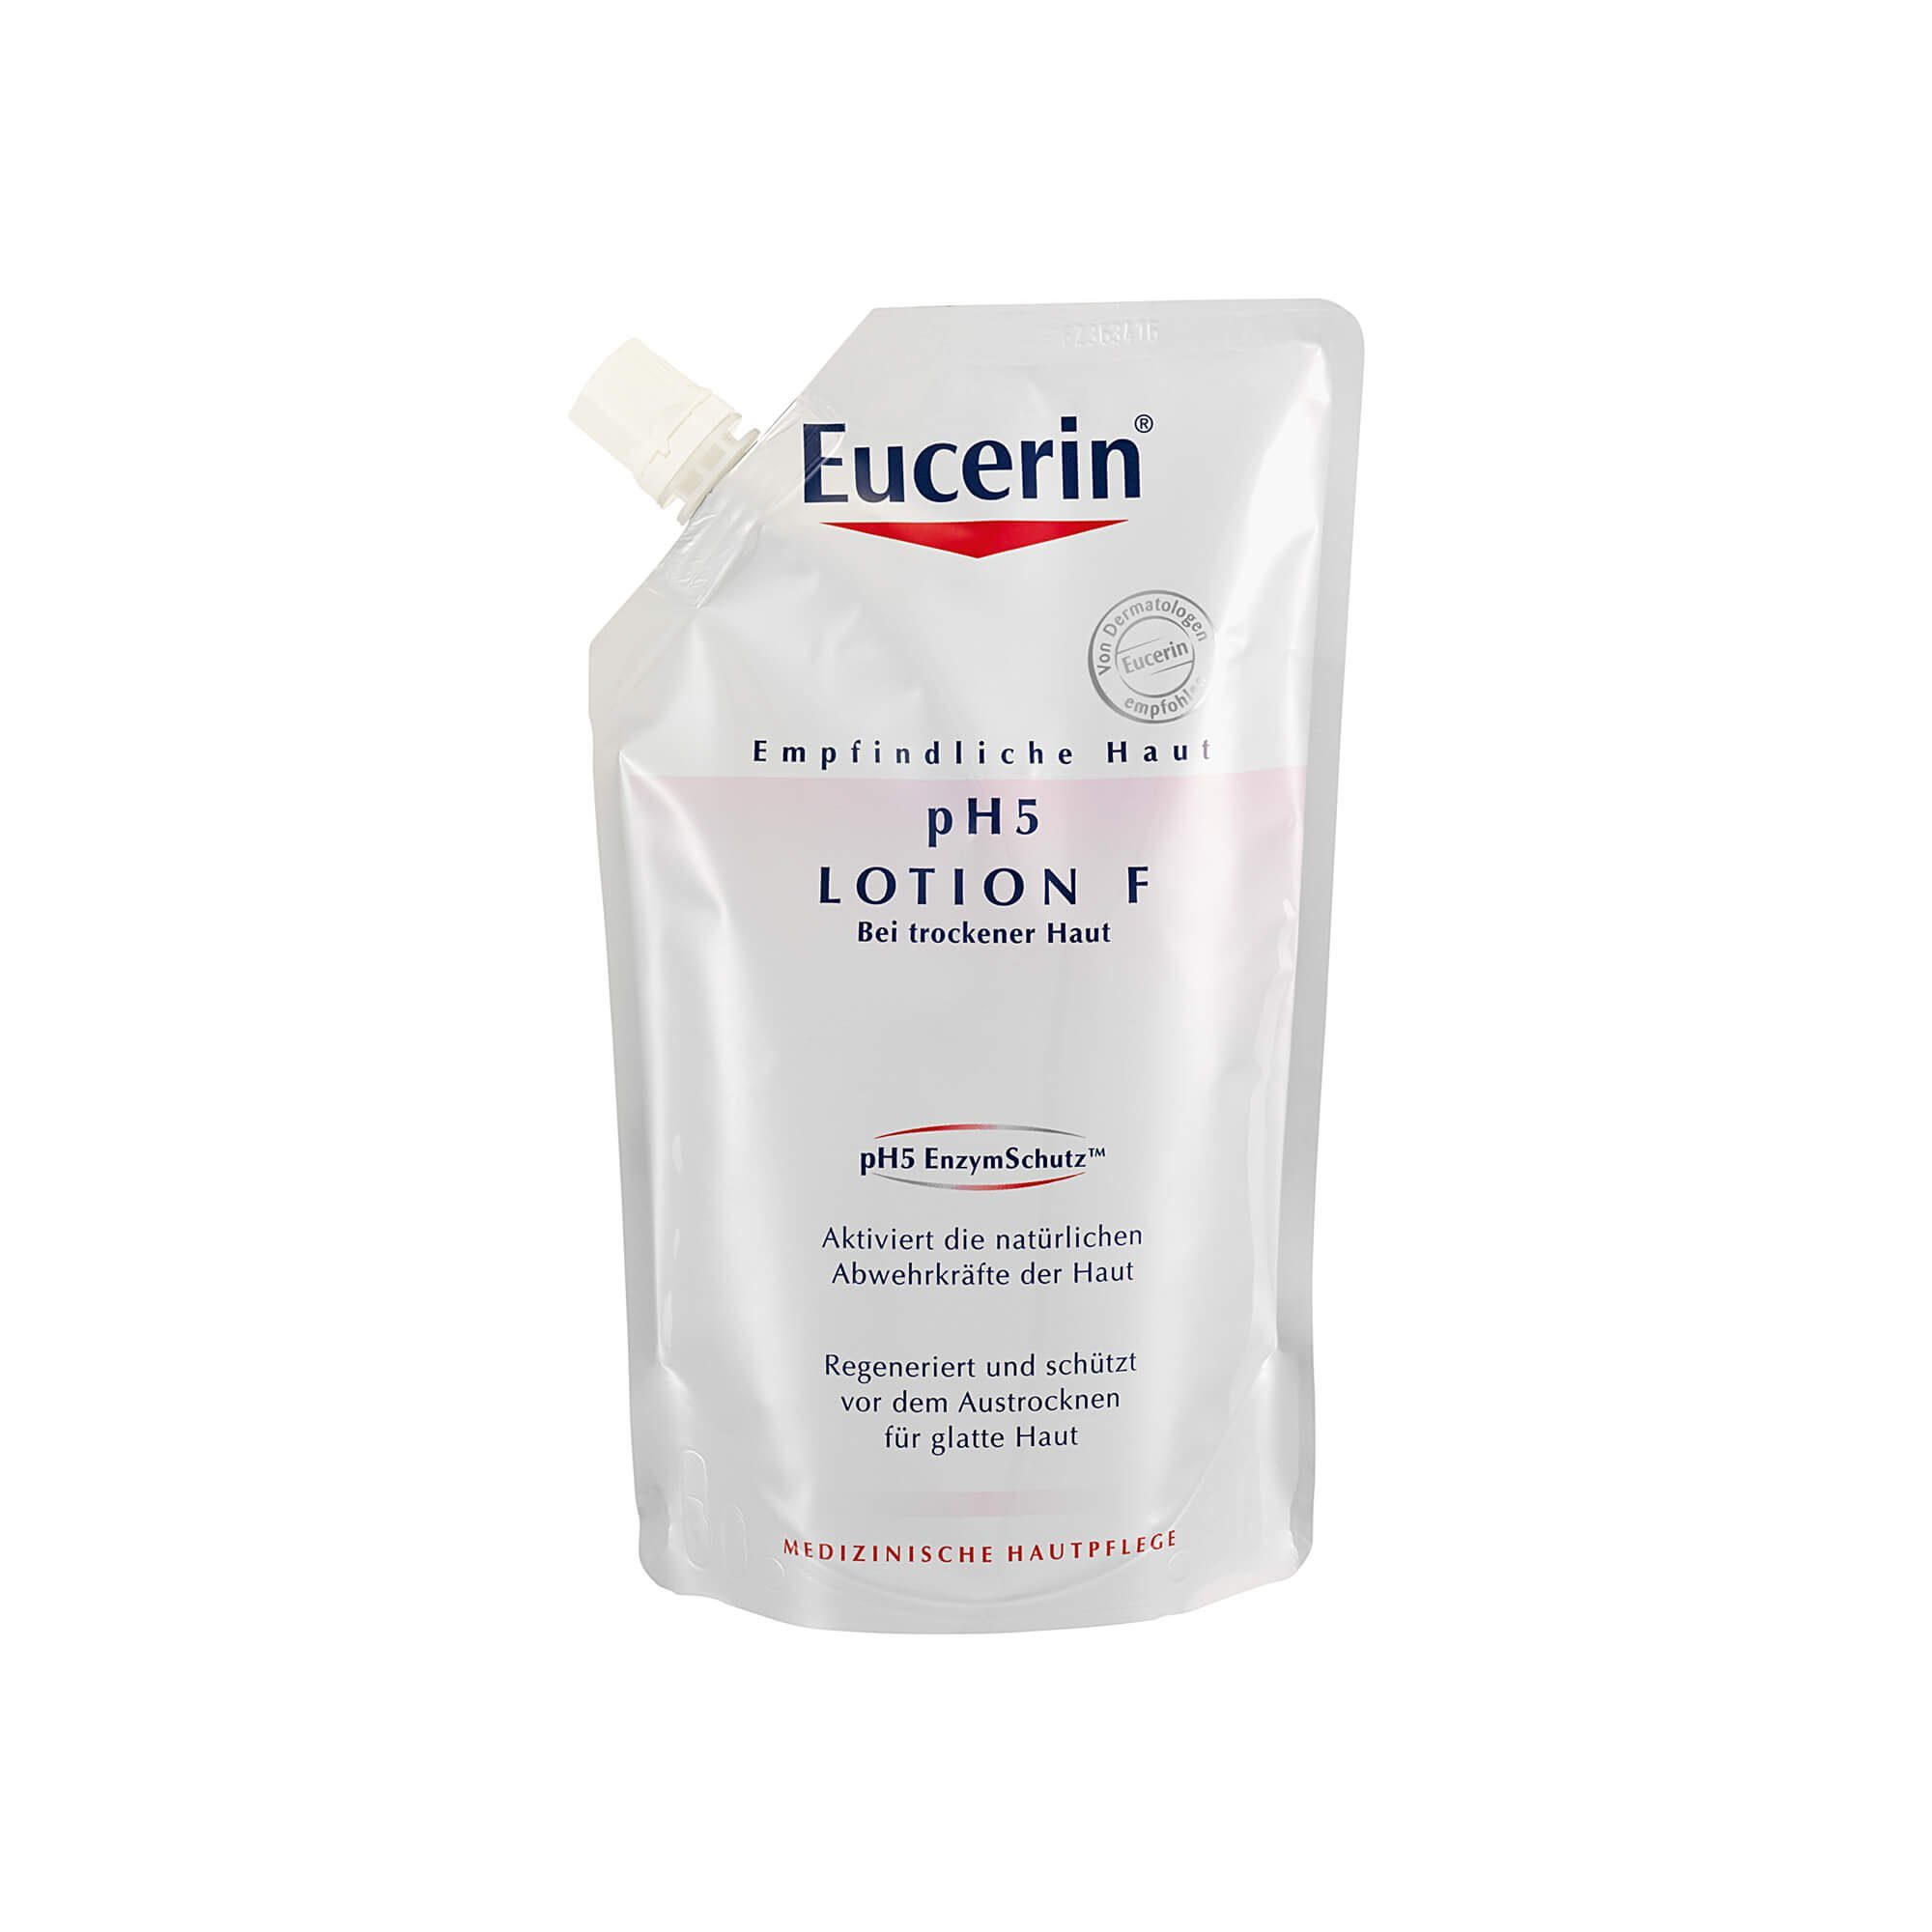 Eucerin Eucerin pH5 Intensiv Lotio F Nachfüllbeutel , 400 ml